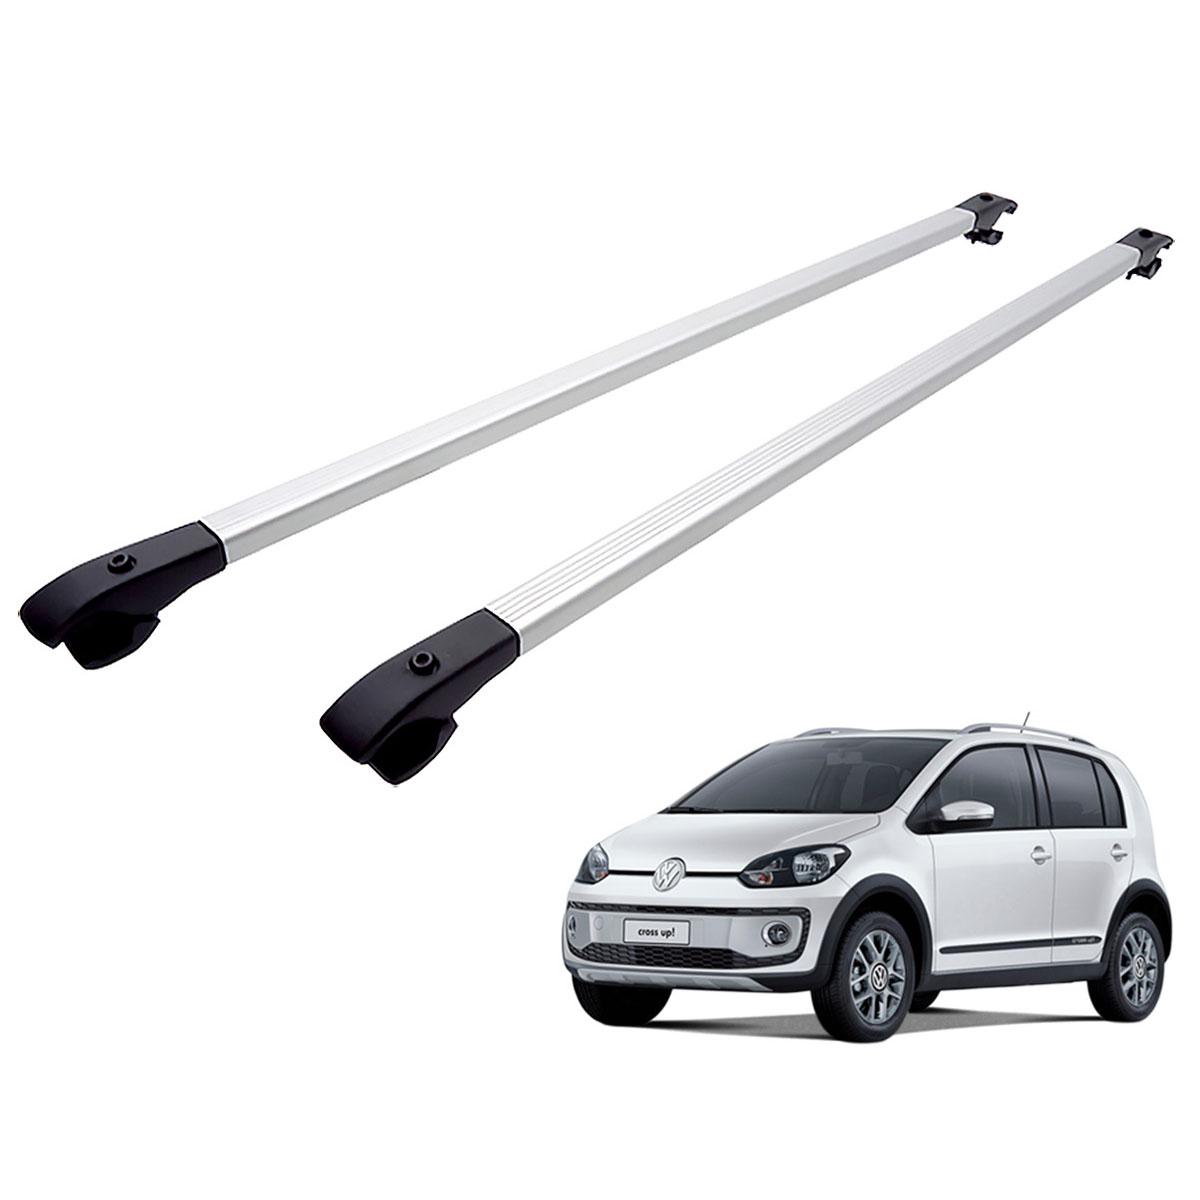 Travessa rack de teto alumínio UP! Cross VW up 2014 a 2017